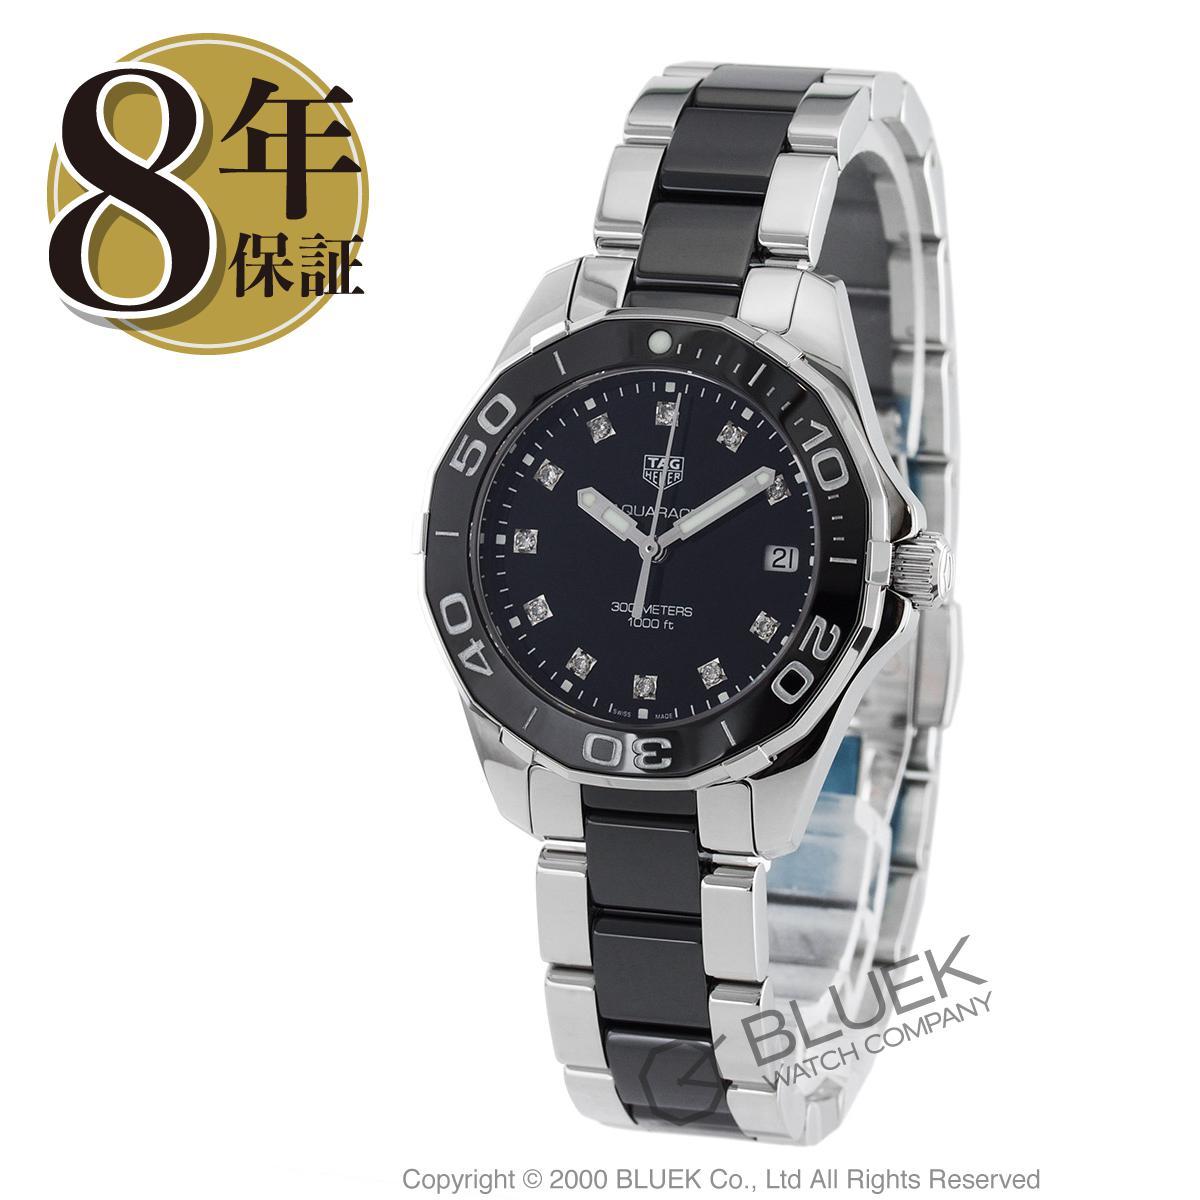 e60c02511f7c タグホイヤー アクアレーサー 300m防水 ダイヤ 腕時計 レディース TAG Heuer WAY131C.